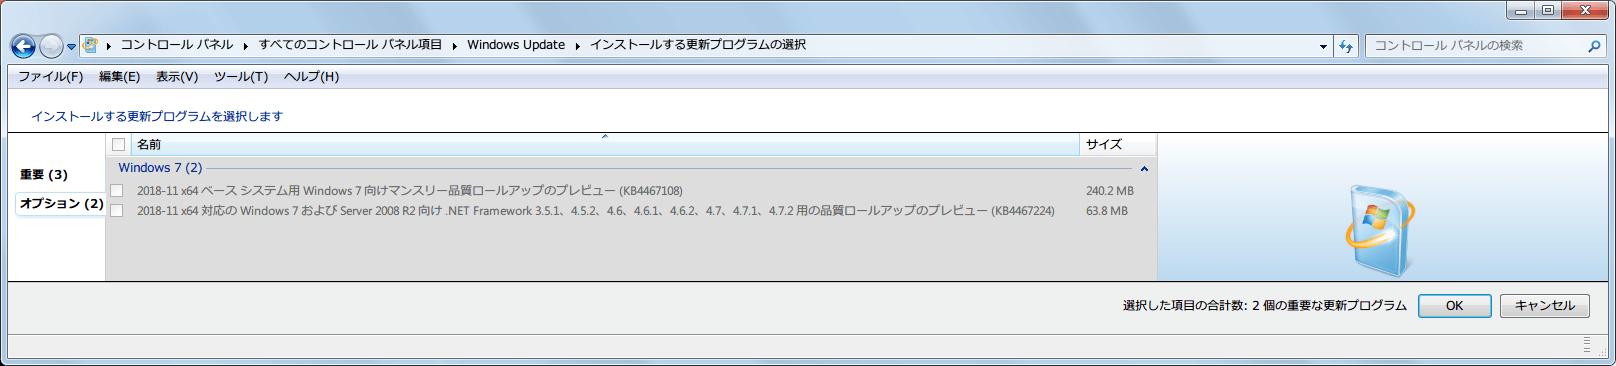 Windows 7 64bit Windows Update オプション 2018年11月分リスト KB4467108、KB4467224 非表示